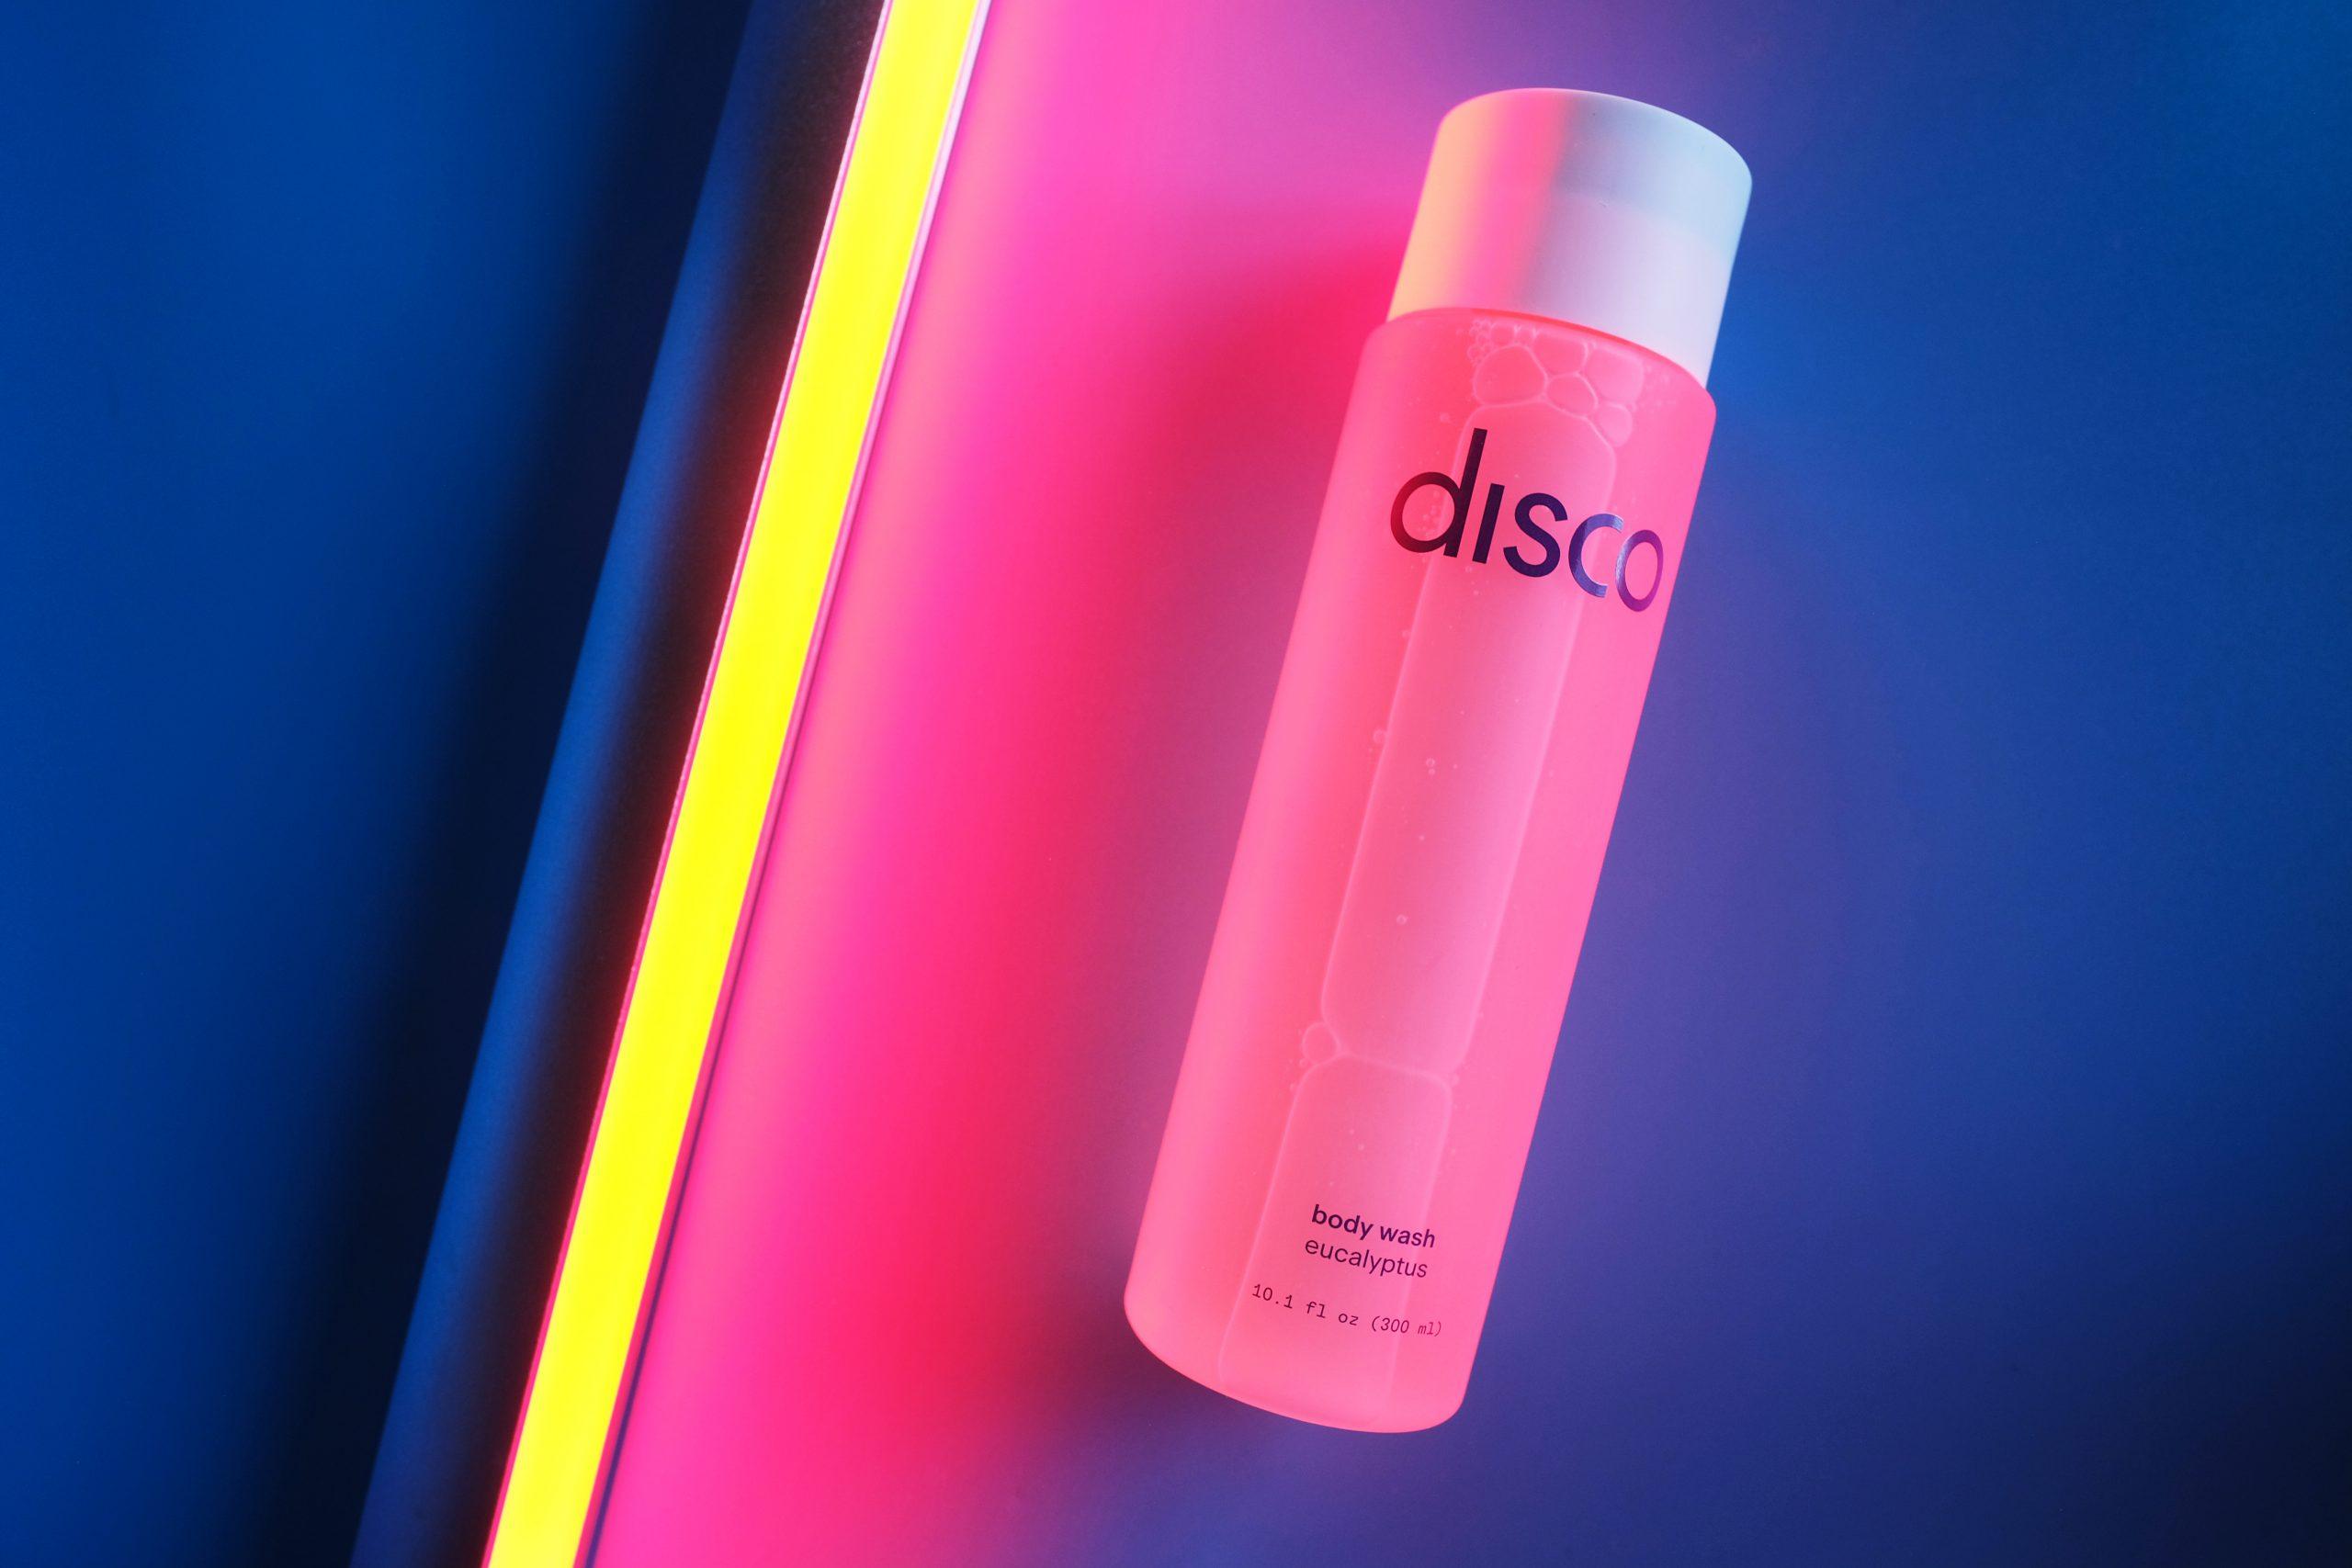 Disco Men s Skincare Routine Review